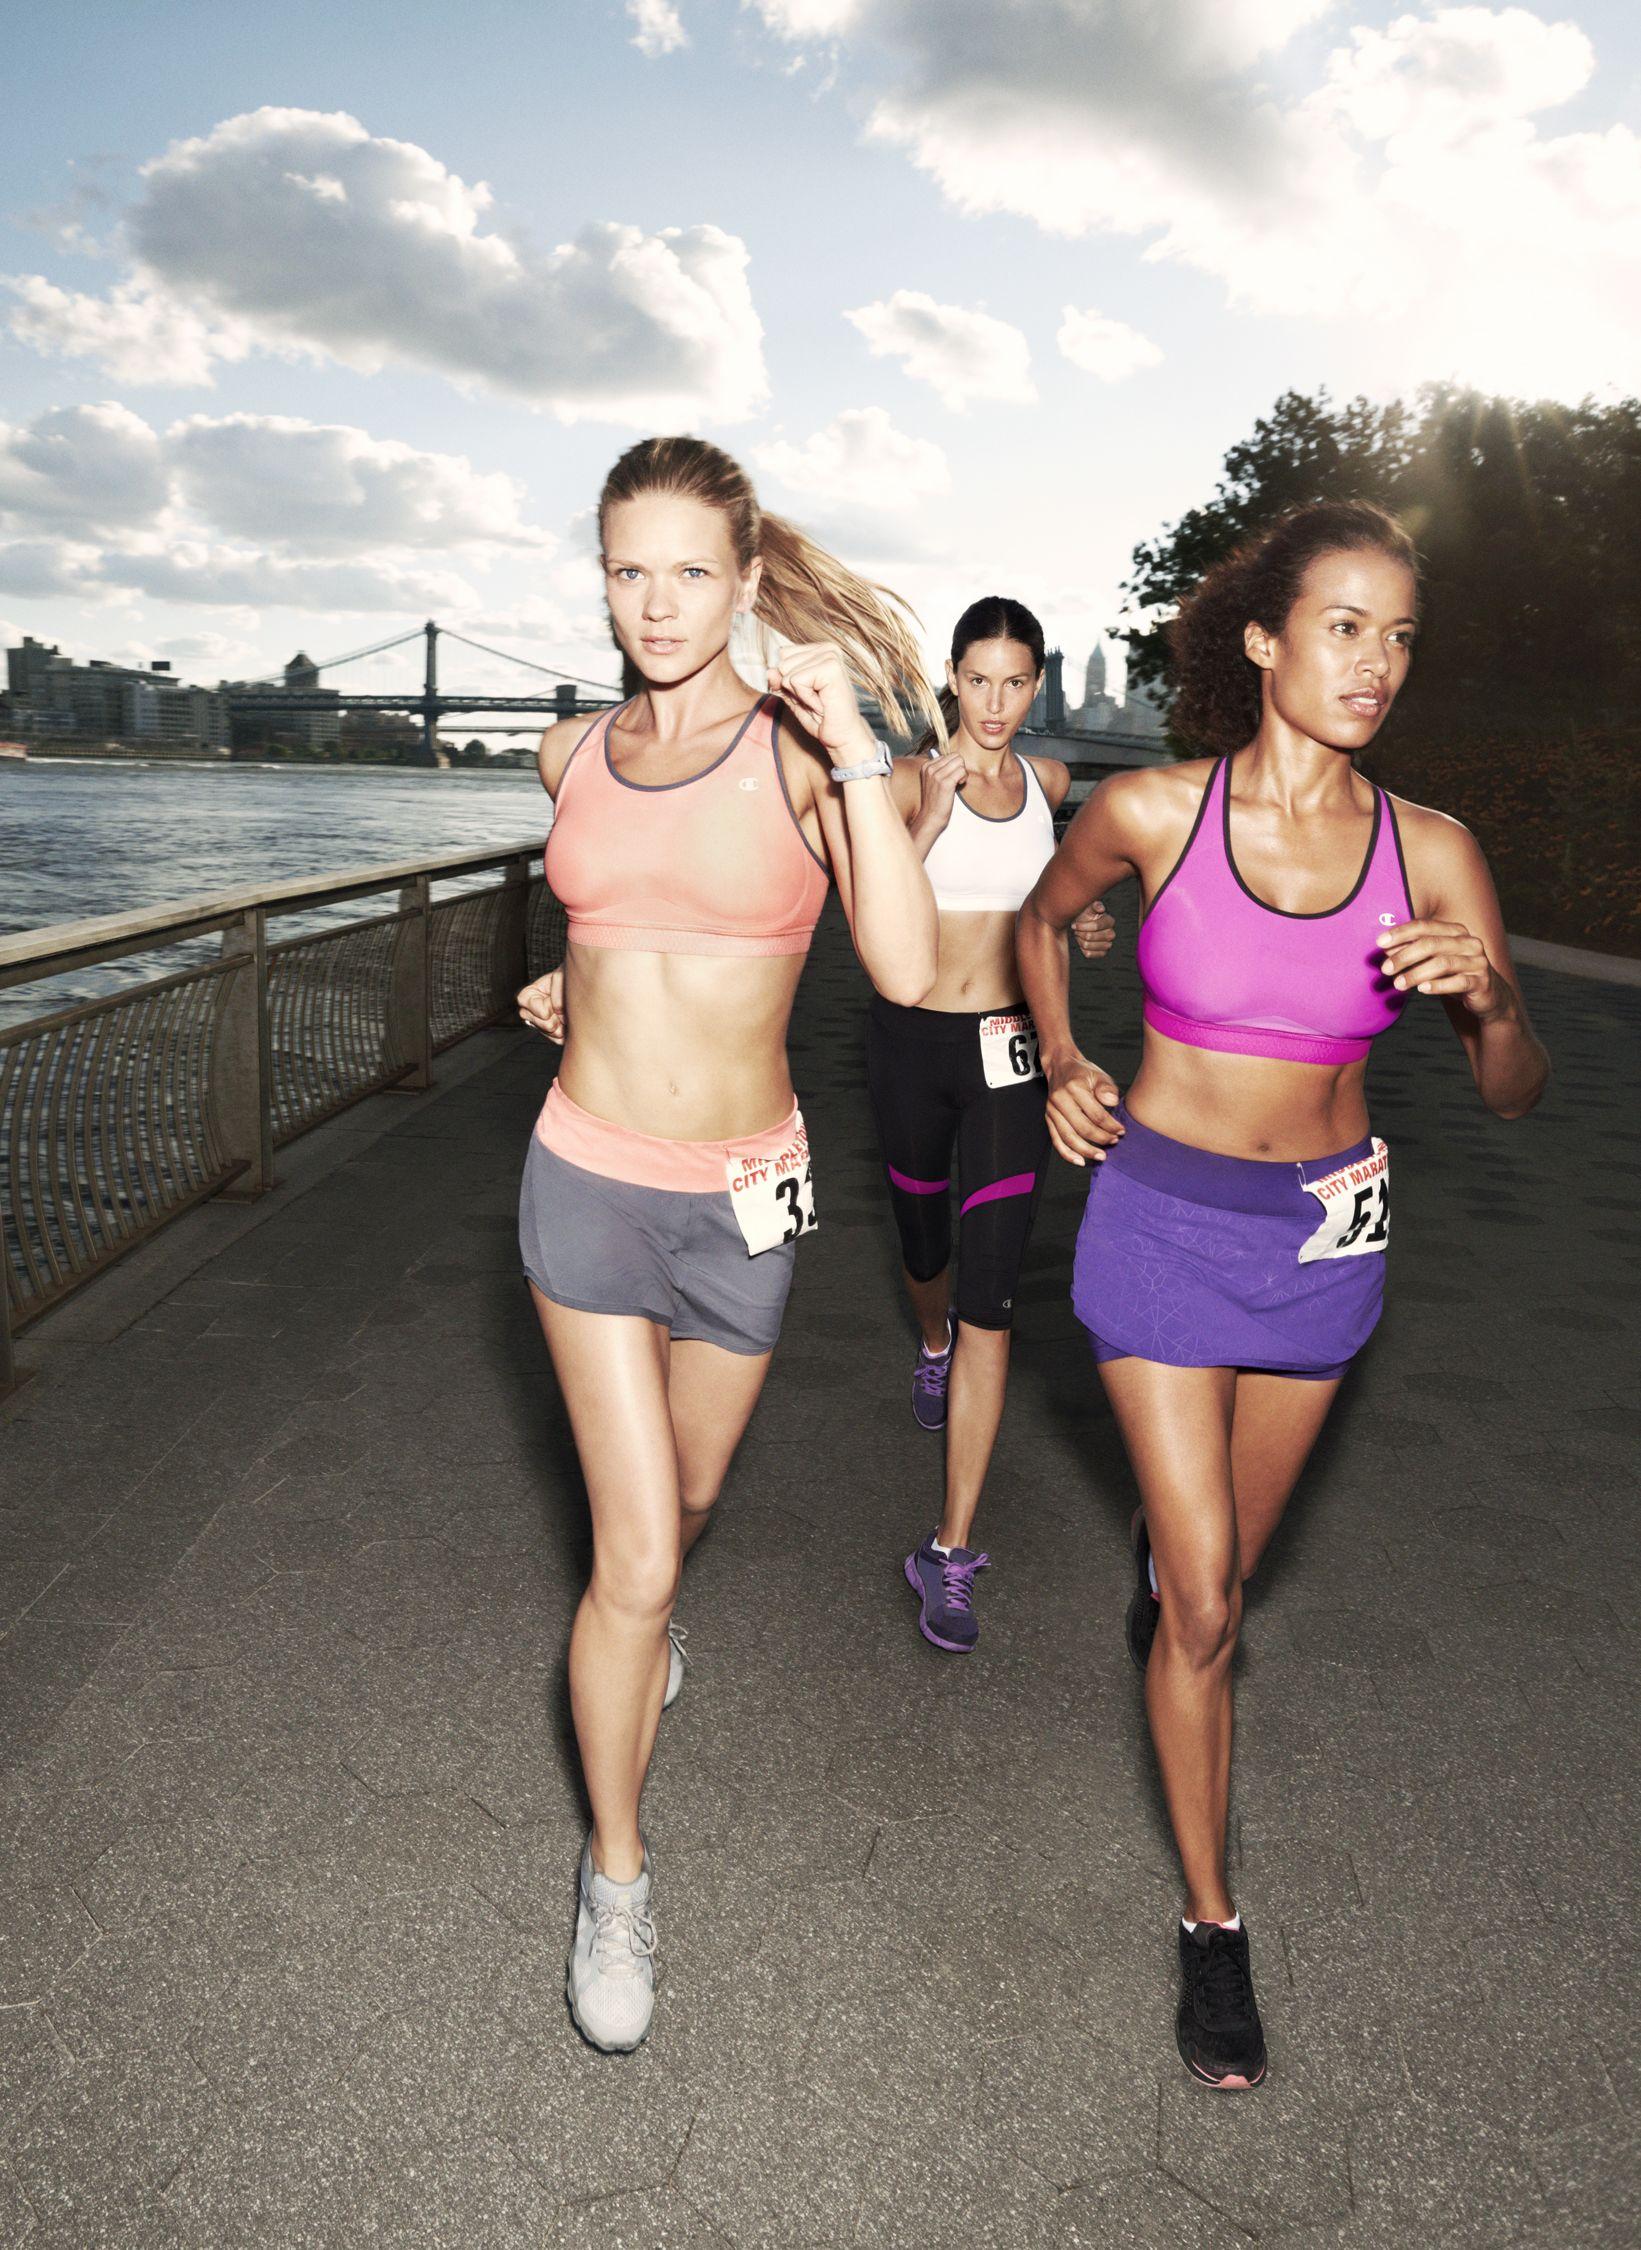 champion marathon sports bra